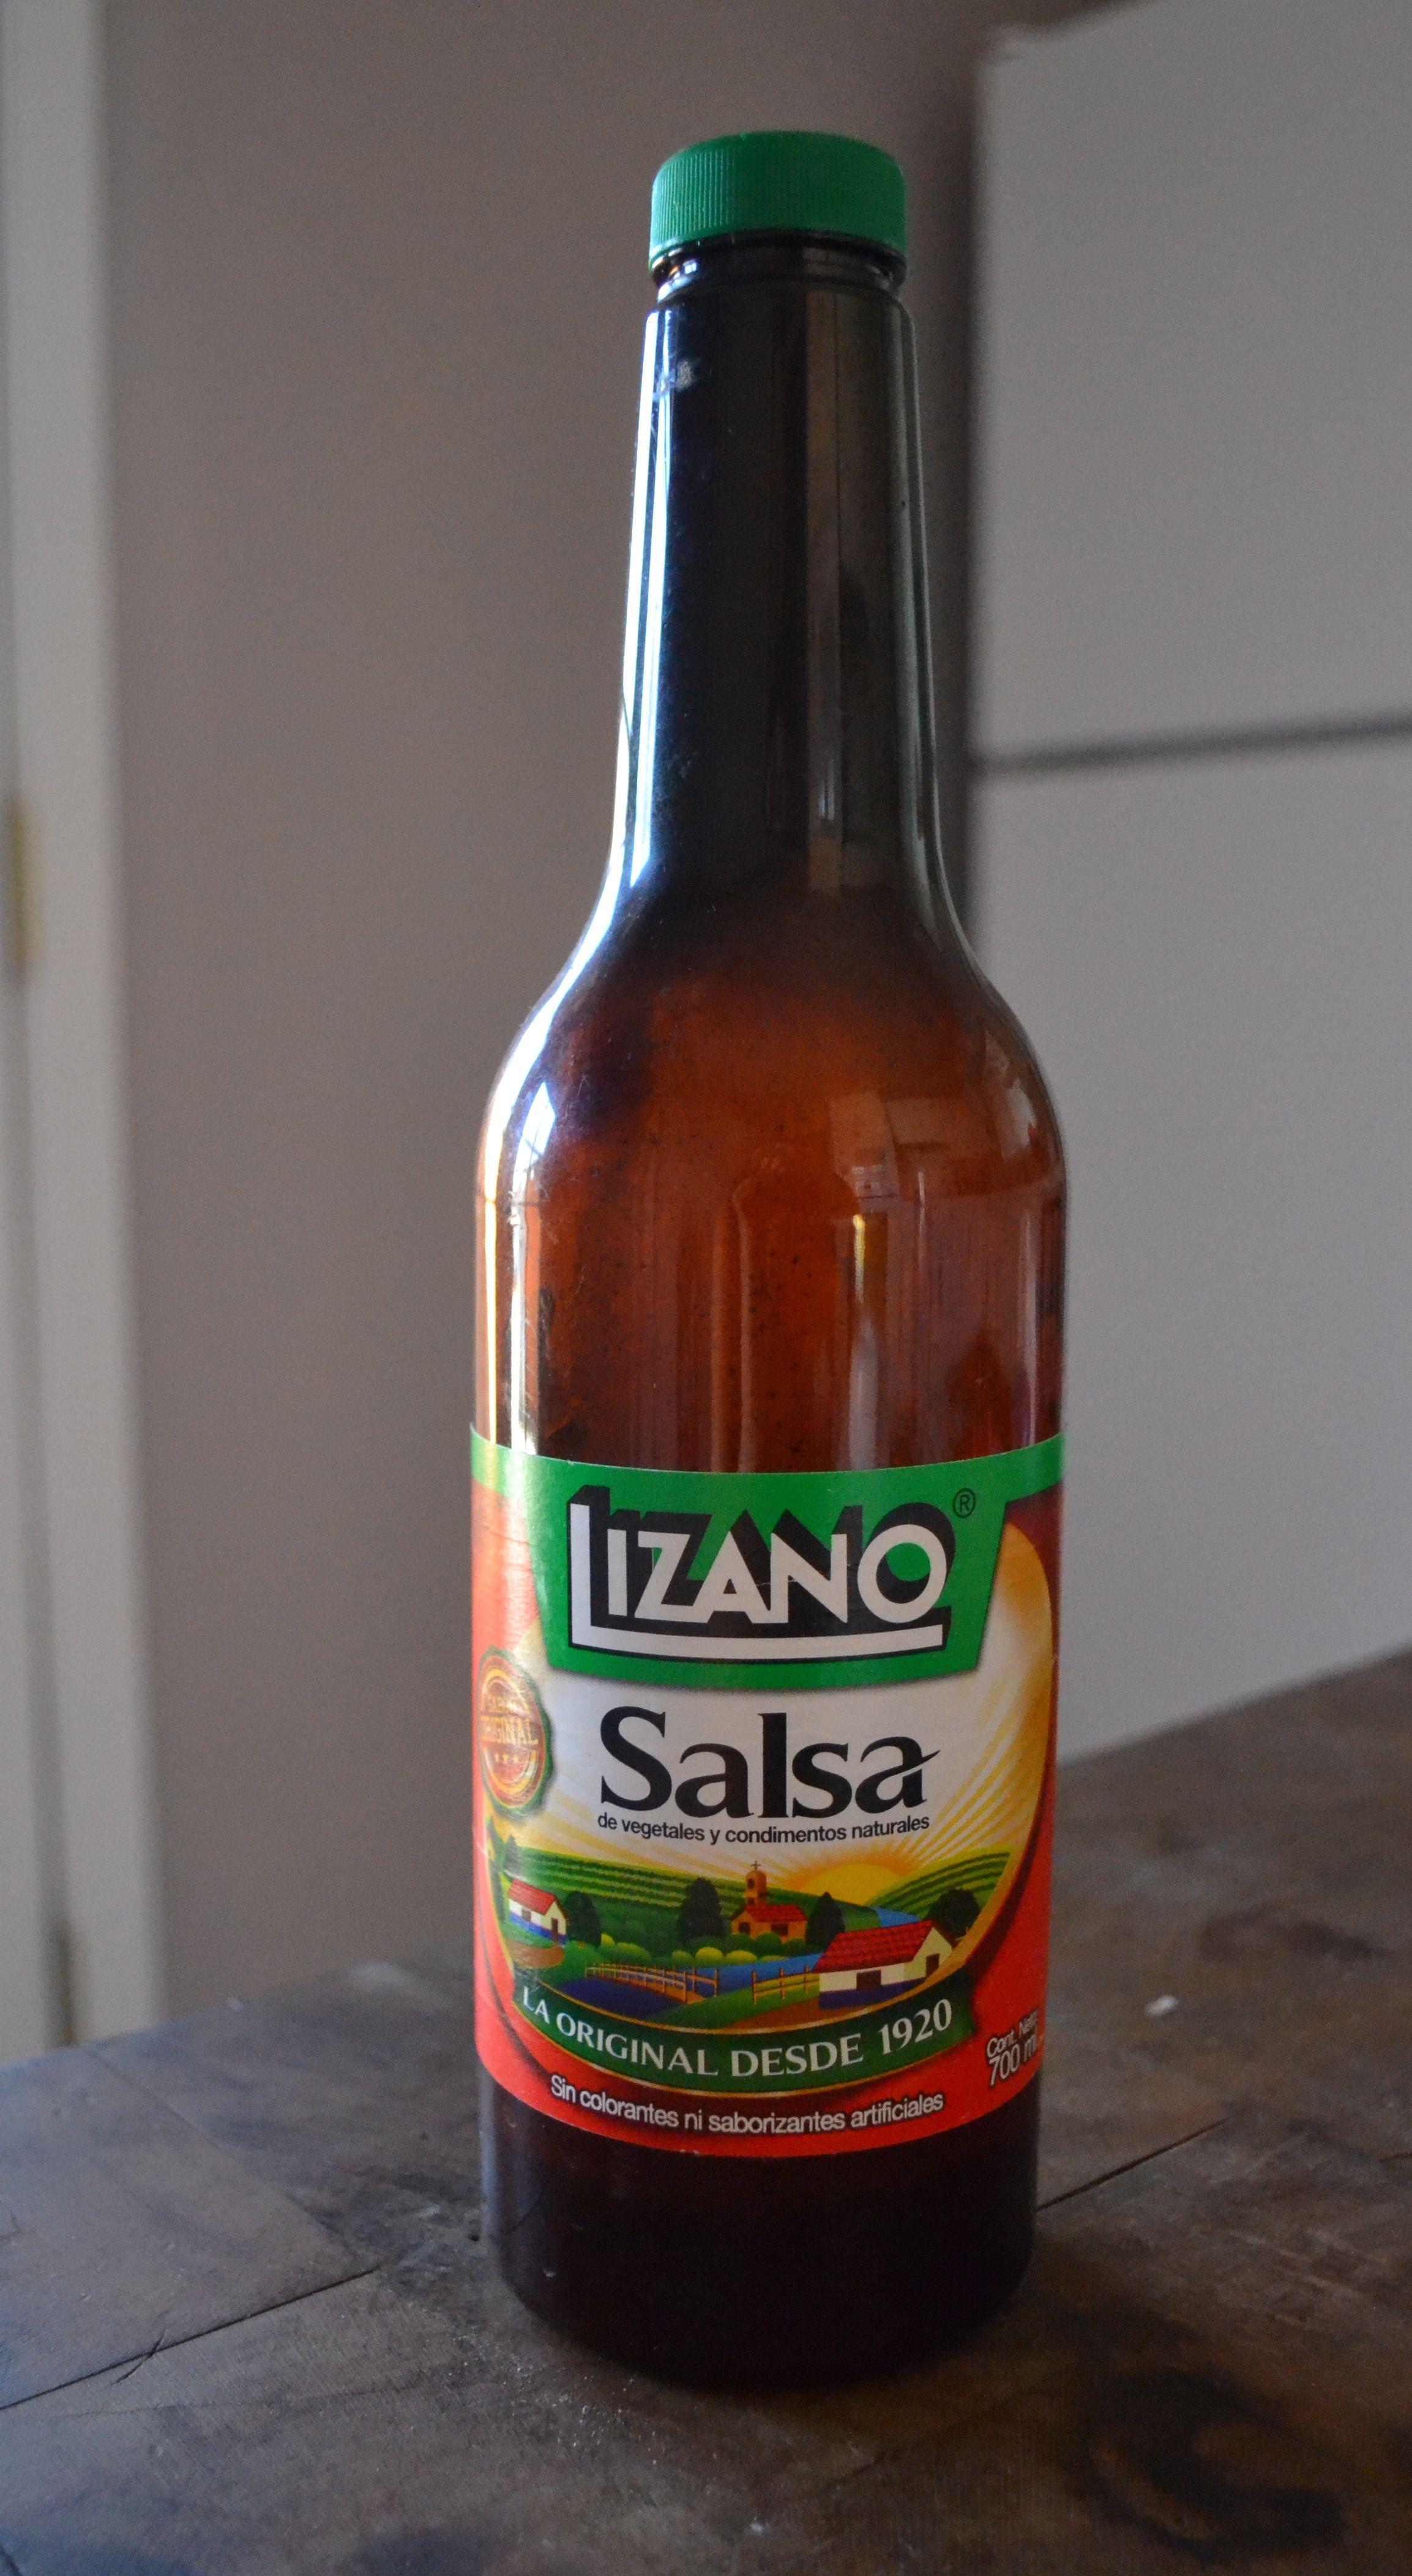 onion chopped lizano style costa rican salsa lizano salsa ...